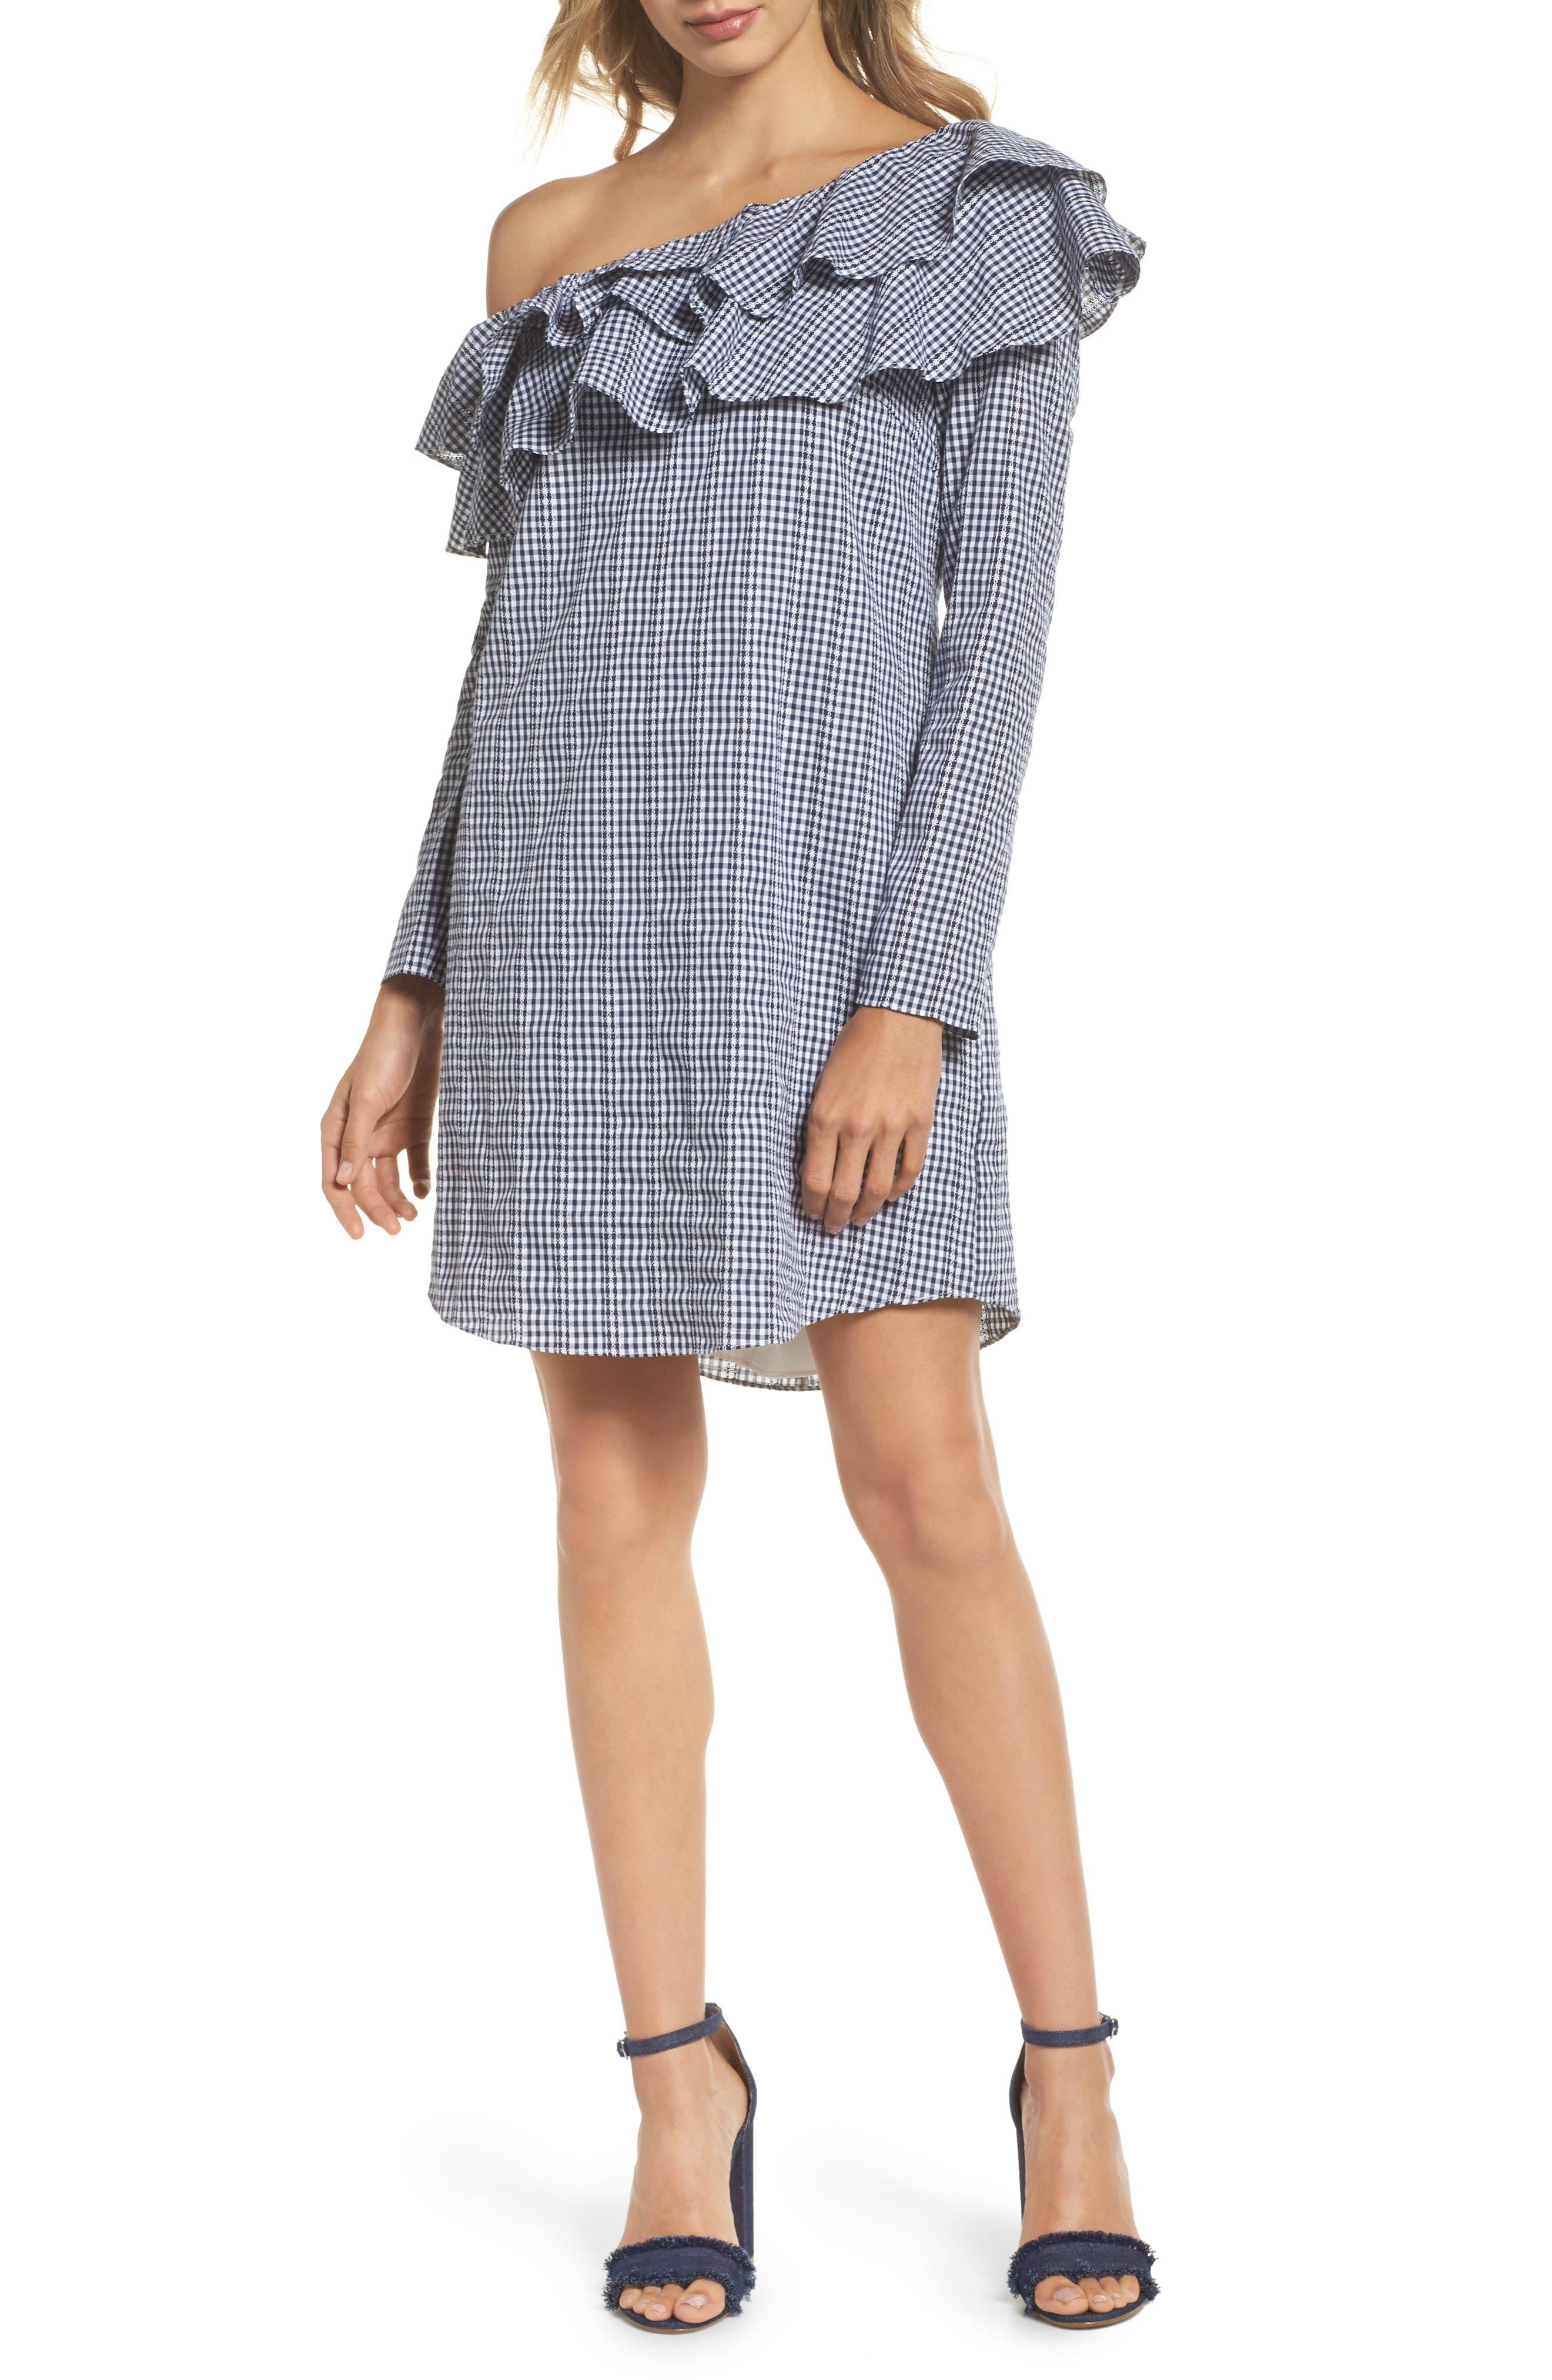 Main Image - Adelyn Rae Gingham One-Shoulder Ruffle Dress